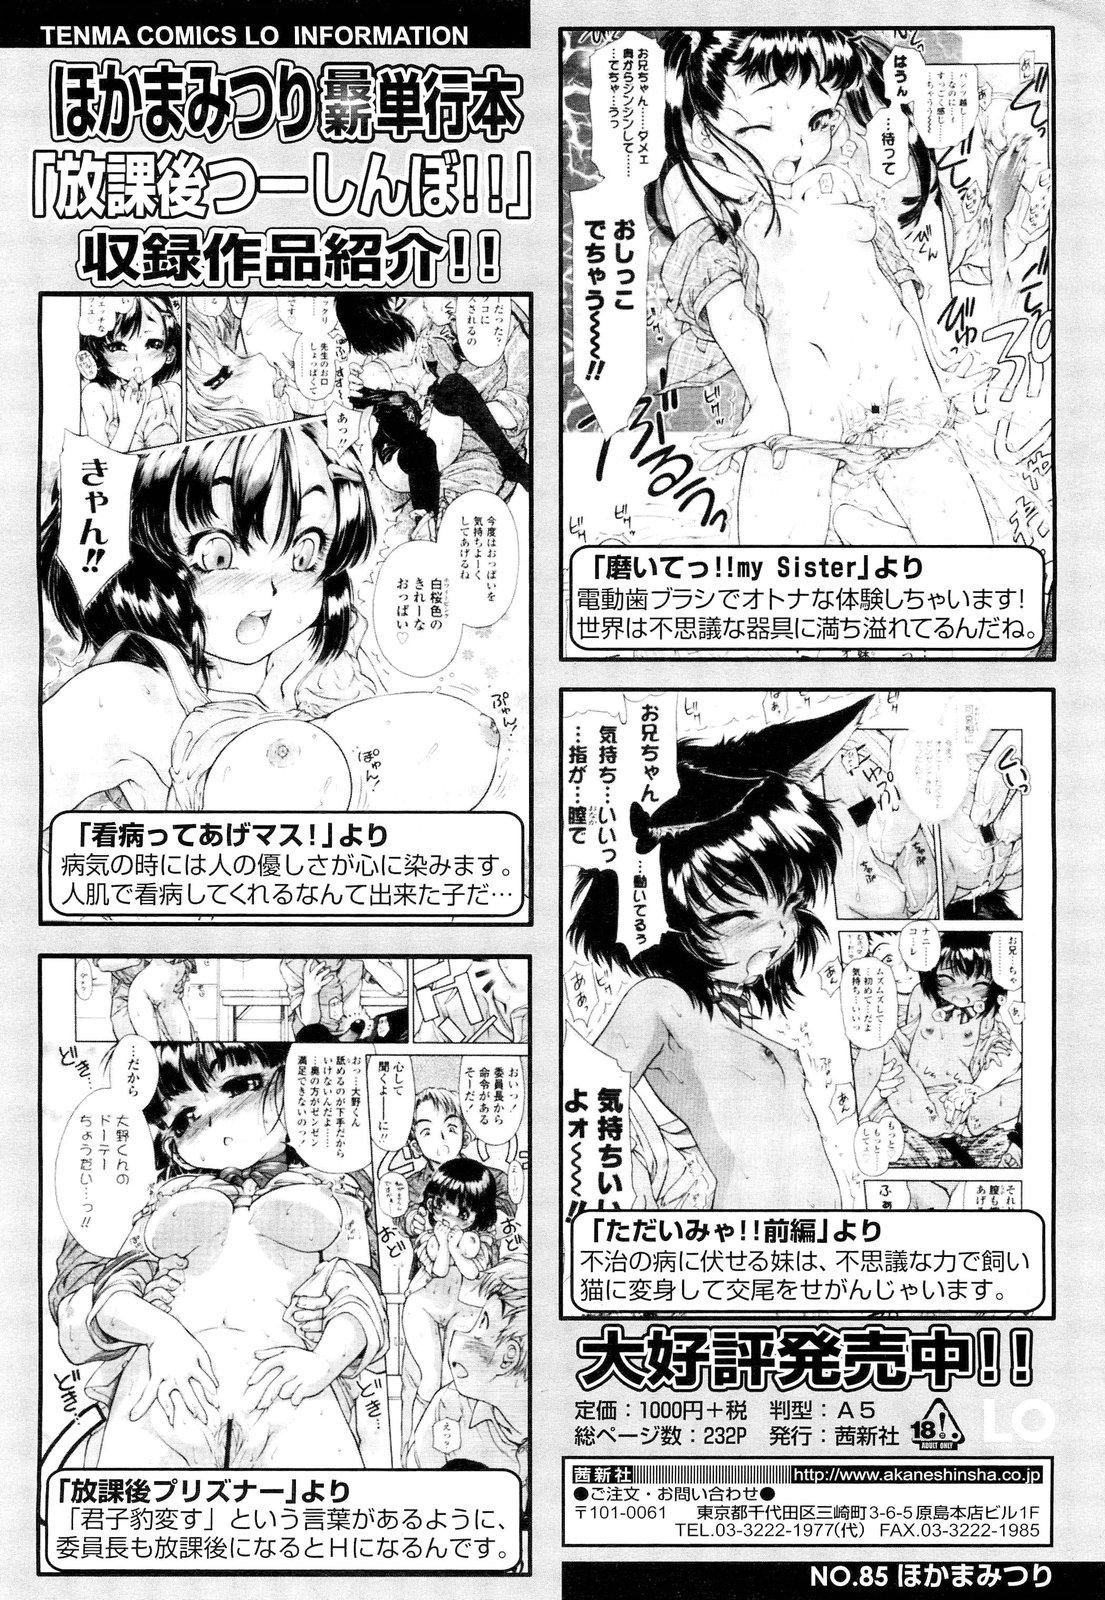 COMIC LO 2012-05 Vol. 98 255